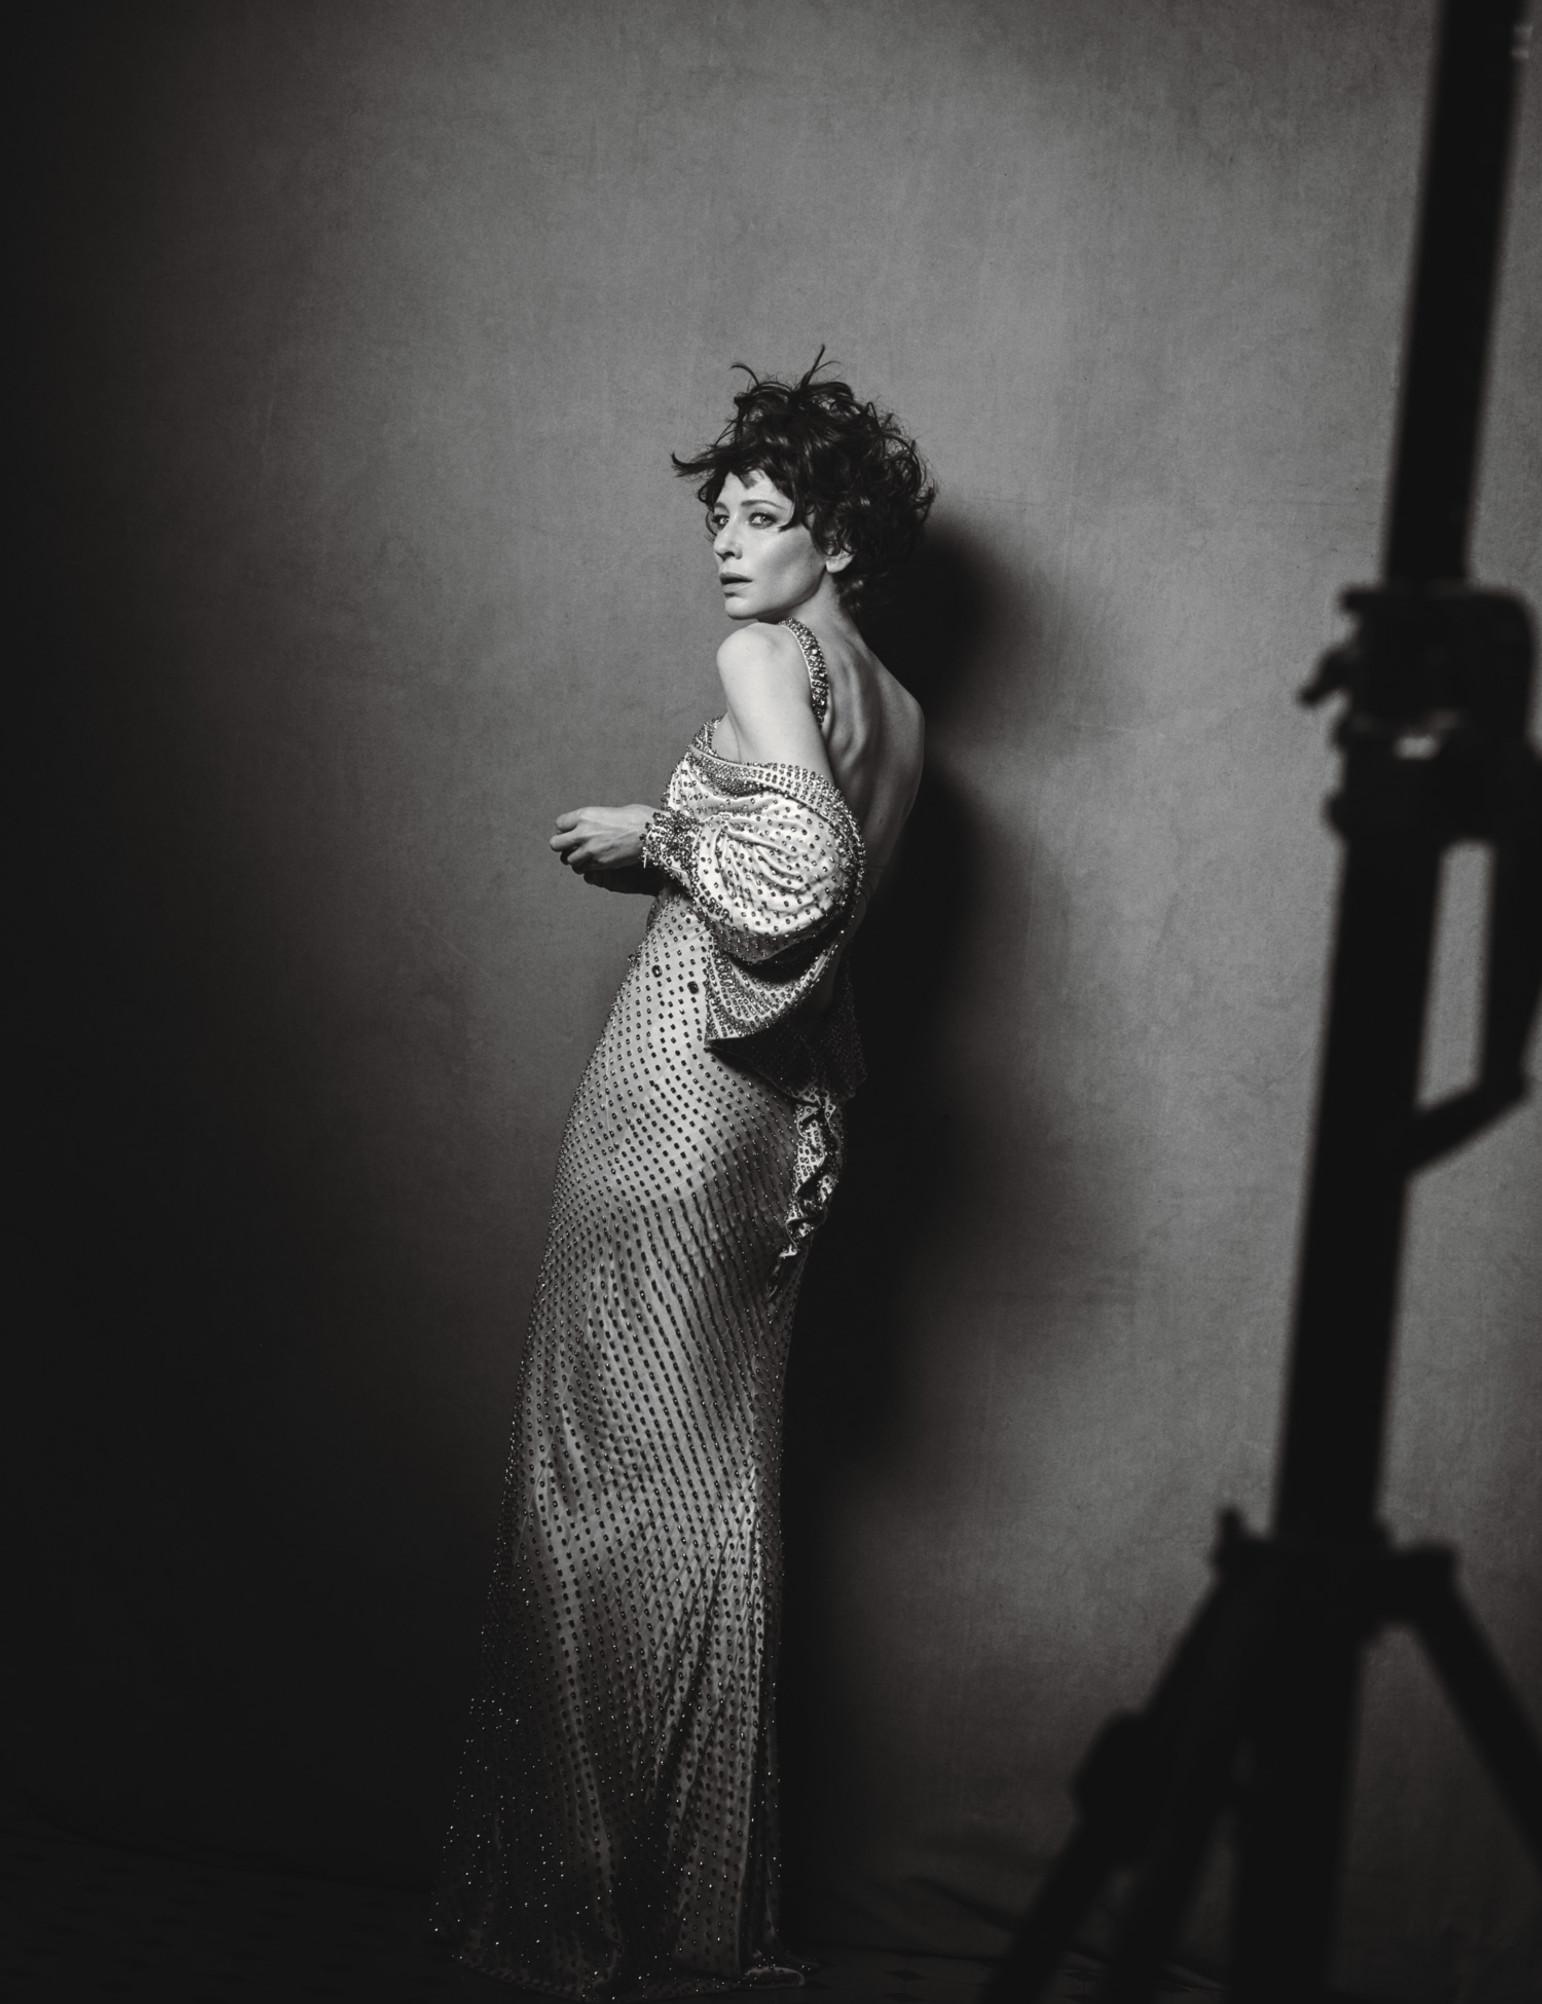 Cate Blanchett featured in W Magazine Photoshoot-1